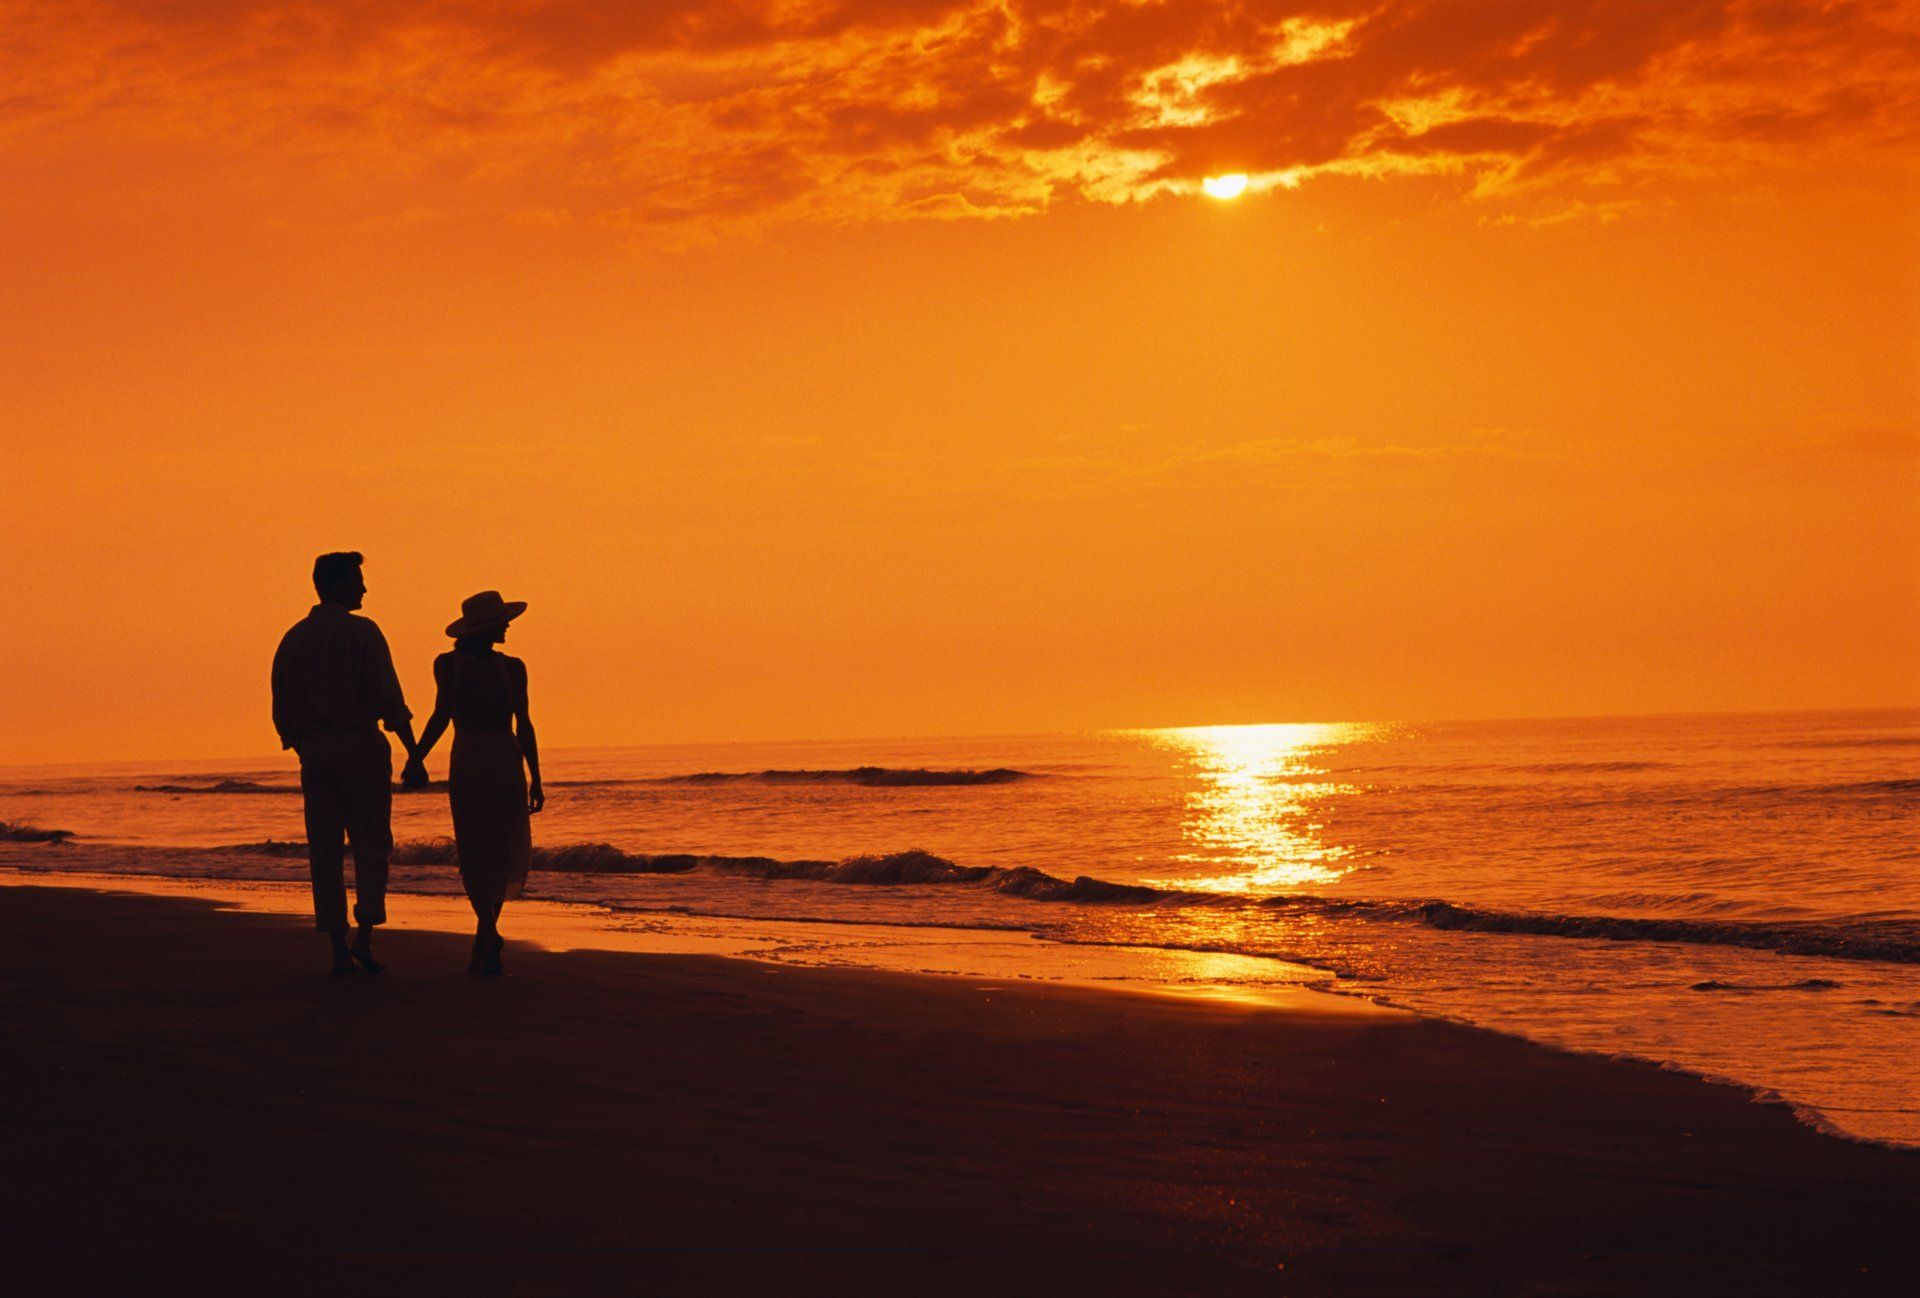 Two Night Sea Beach Silhouettes Sunset Couple Walking Beach Sunset